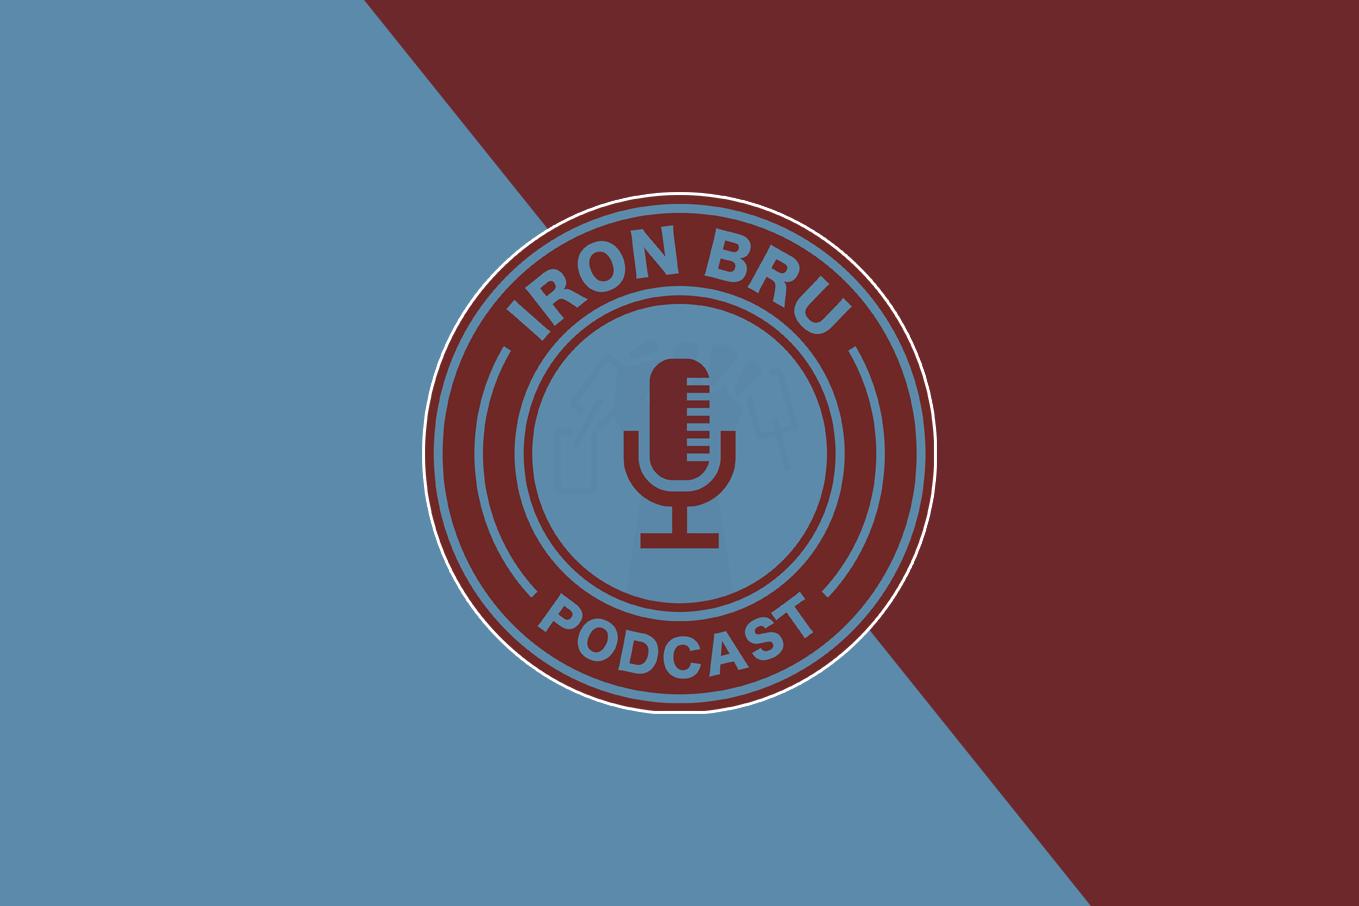 www.iron-bru.co.uk